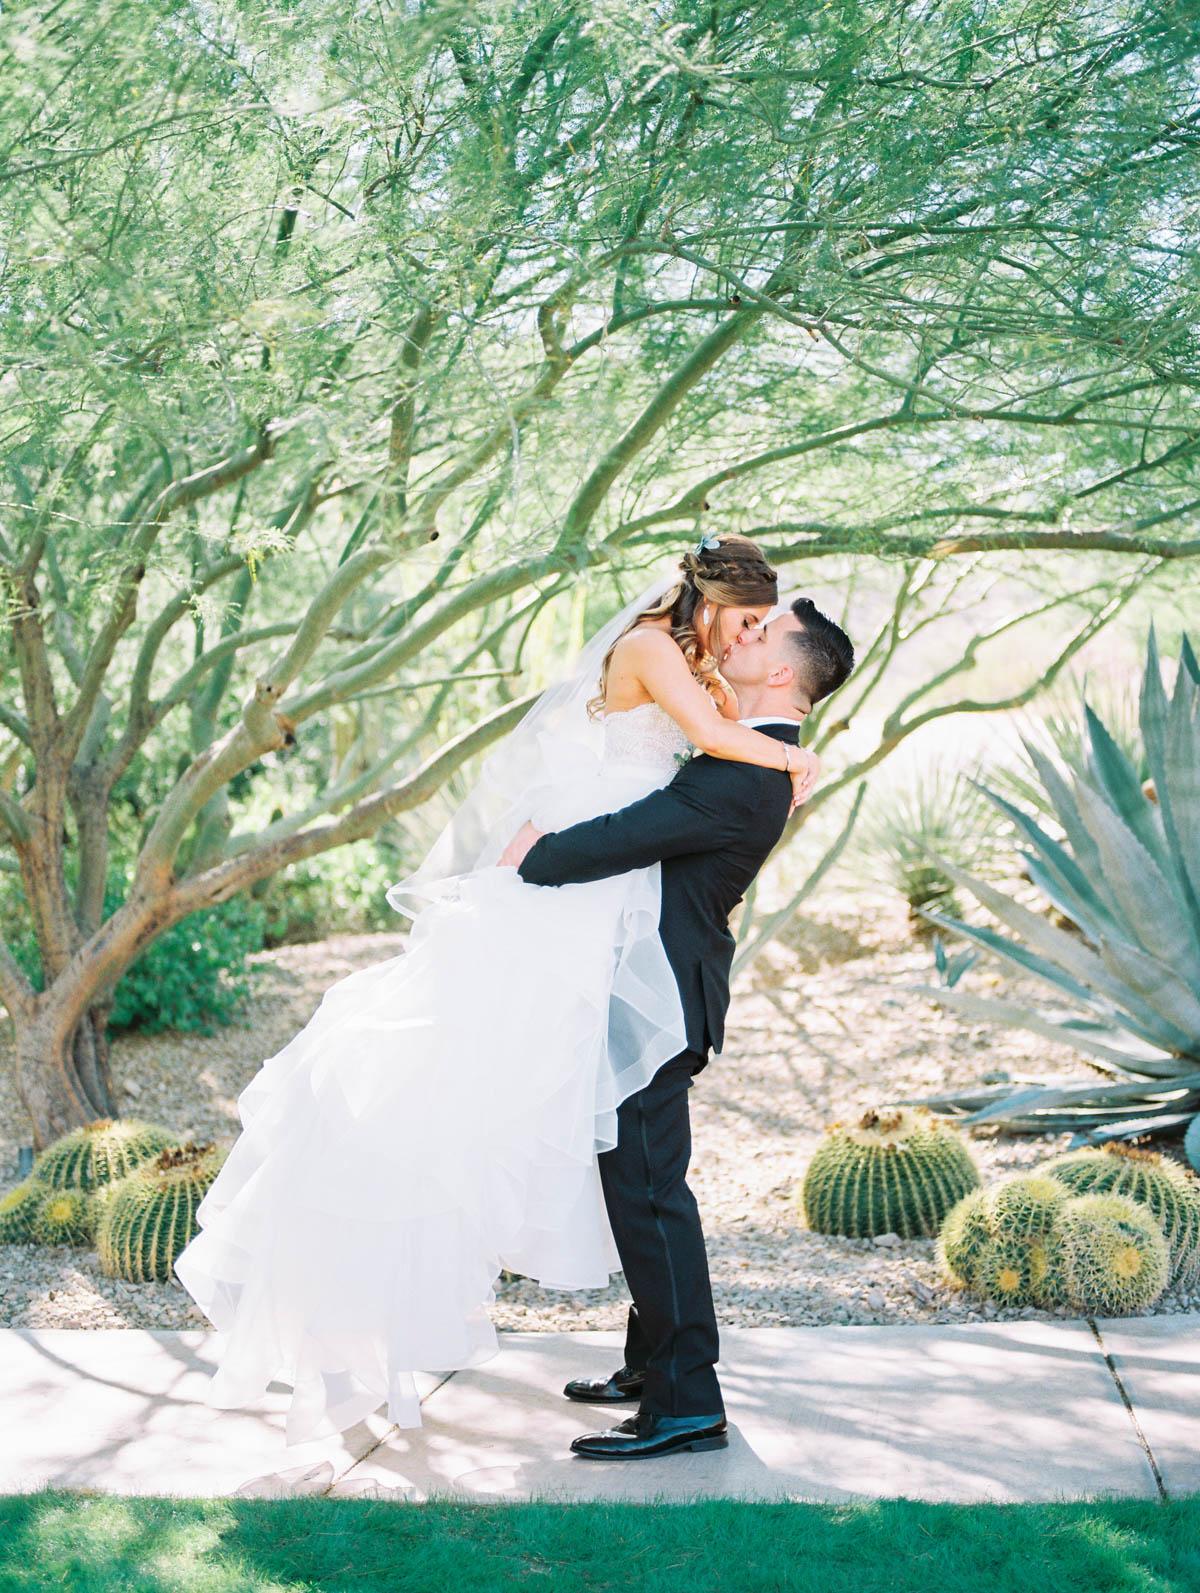 Groom picking up bride kissing captured by Tucson Wedding Photographers Betsy & John